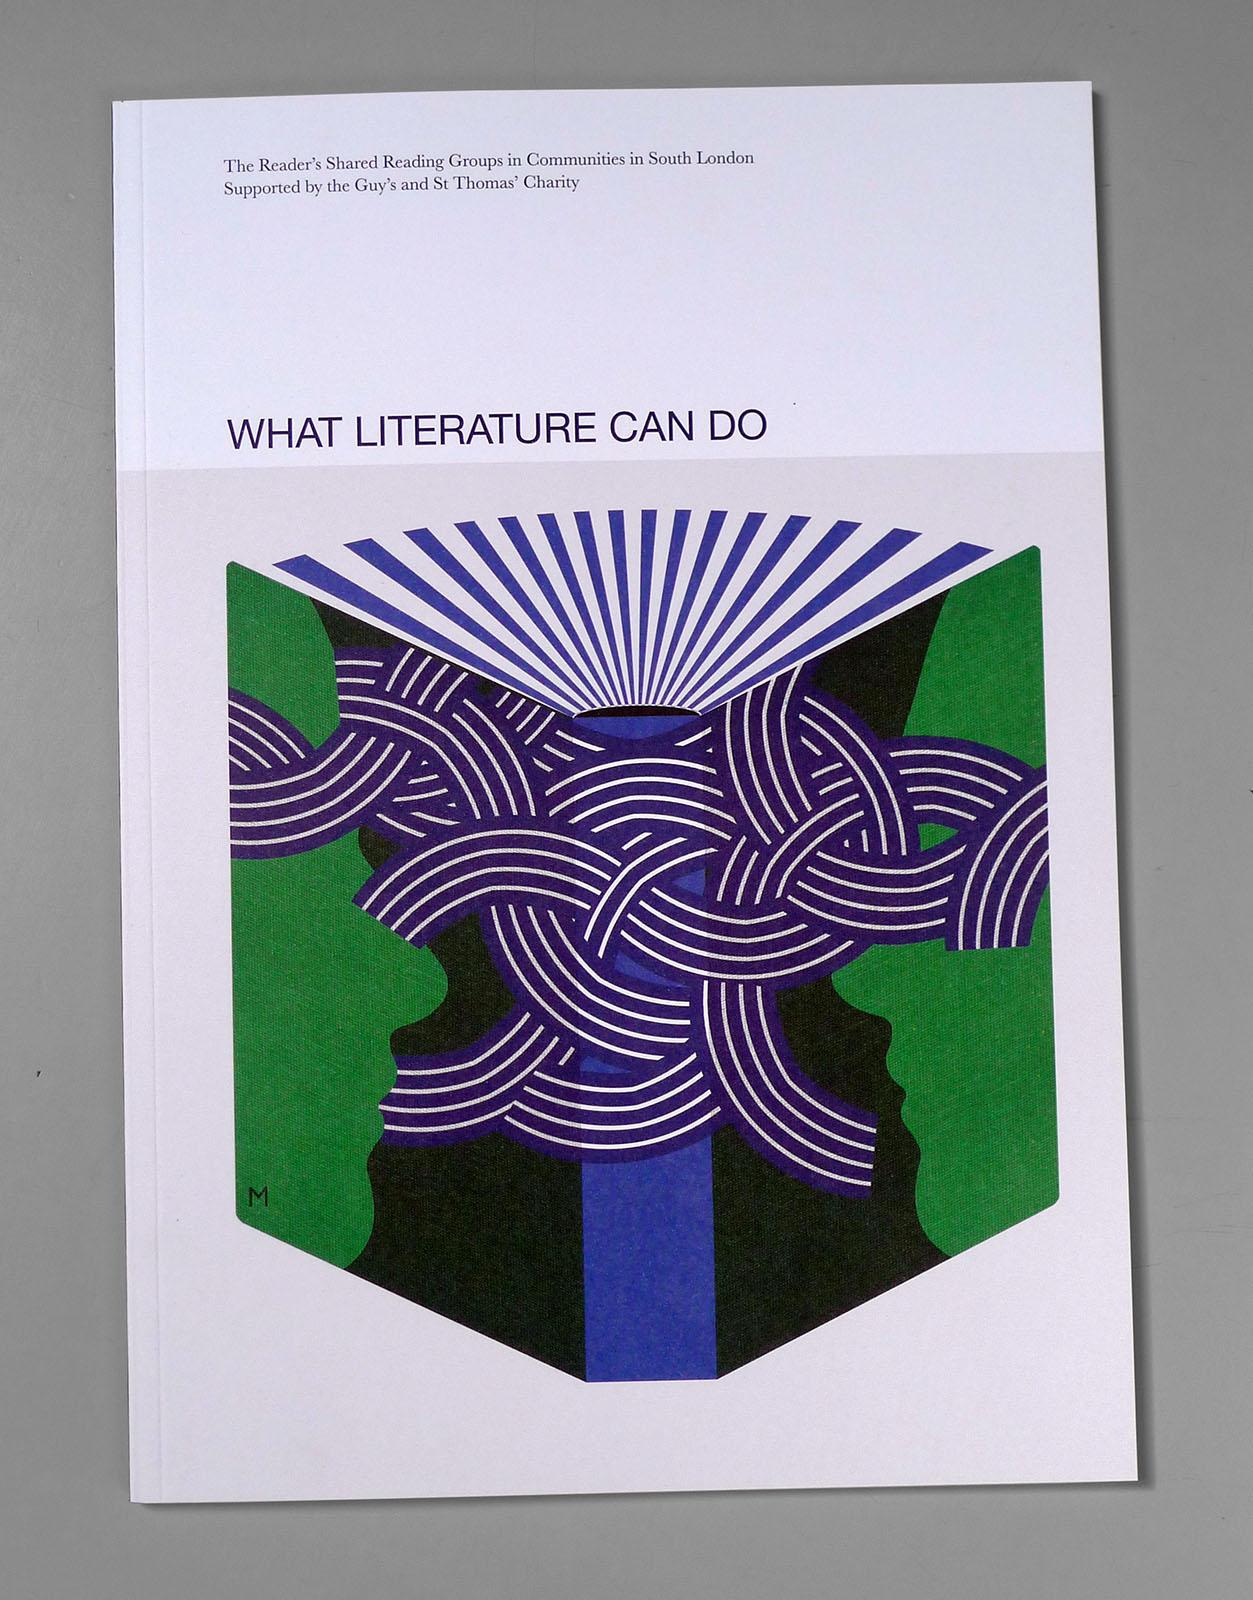 joemagee-LivUni-WhatLitCanDo-Cover.jpg